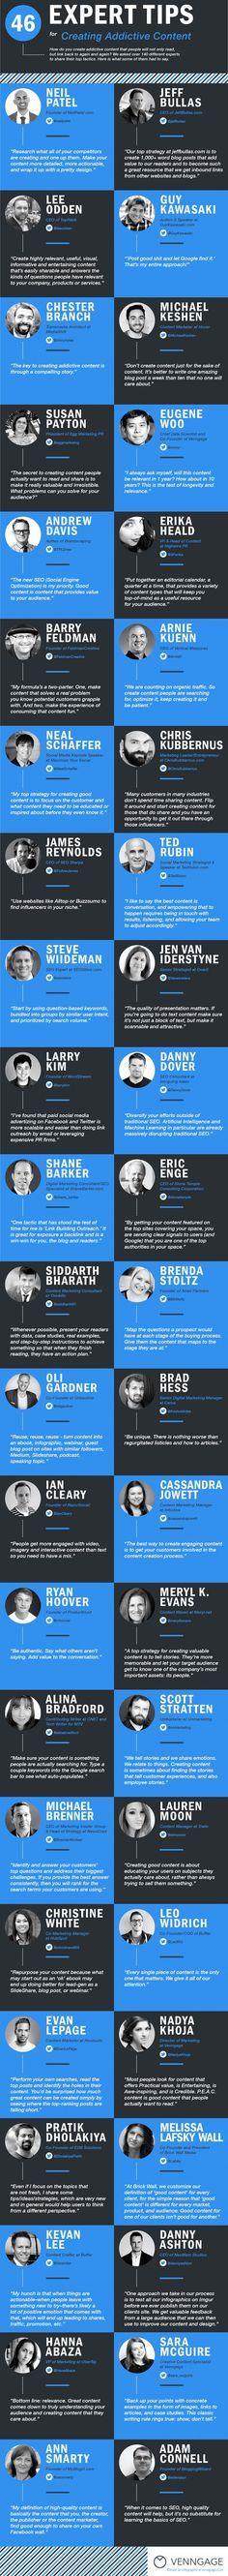 social-media-stra... 46 Tips For Creating Addictive Content venngage.com/...